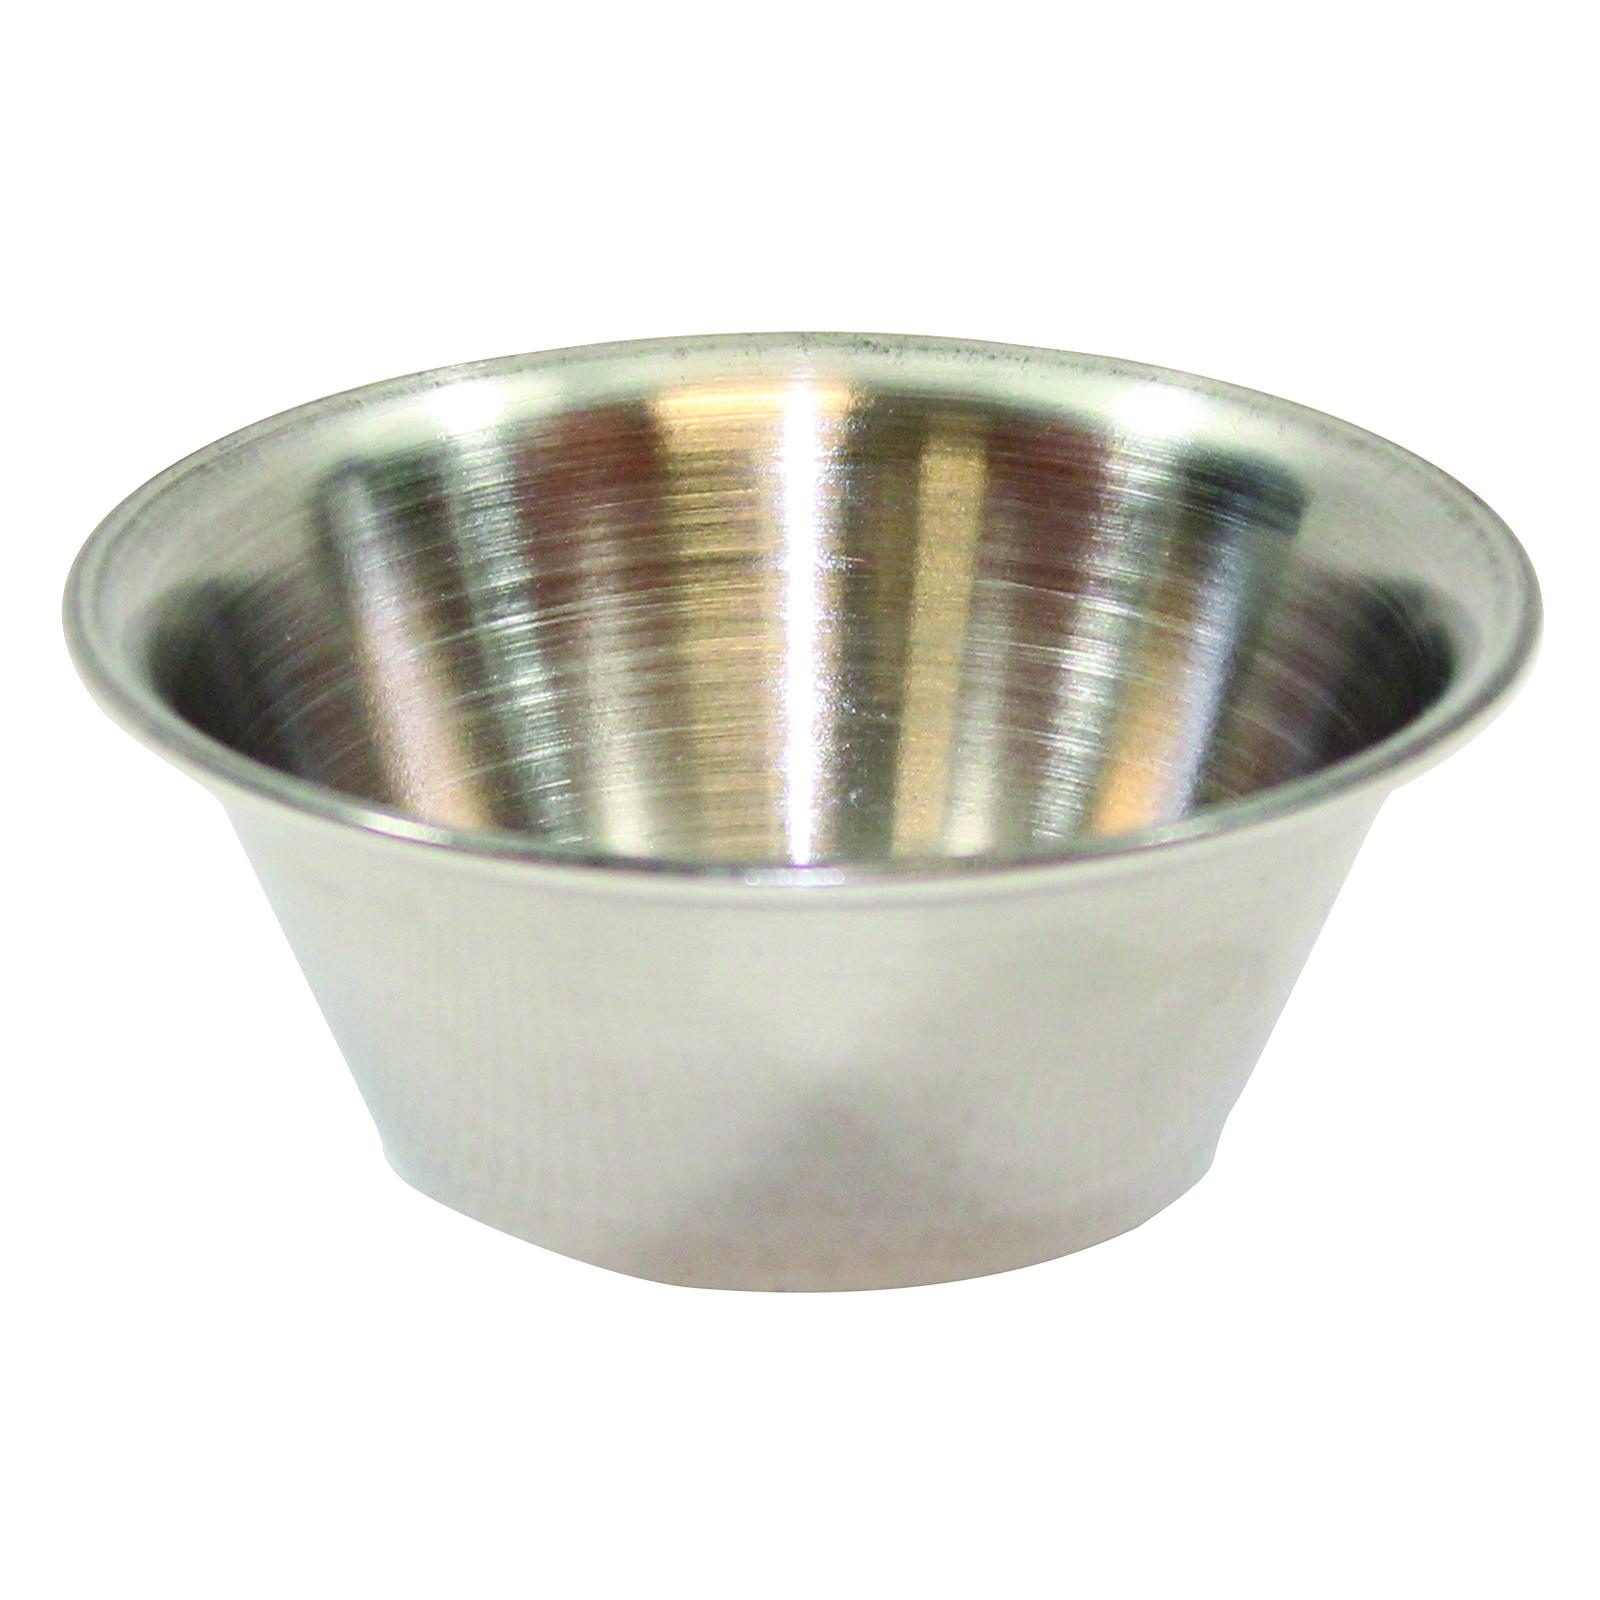 TableCraft Products C5068 ramekin / sauce cup, metal